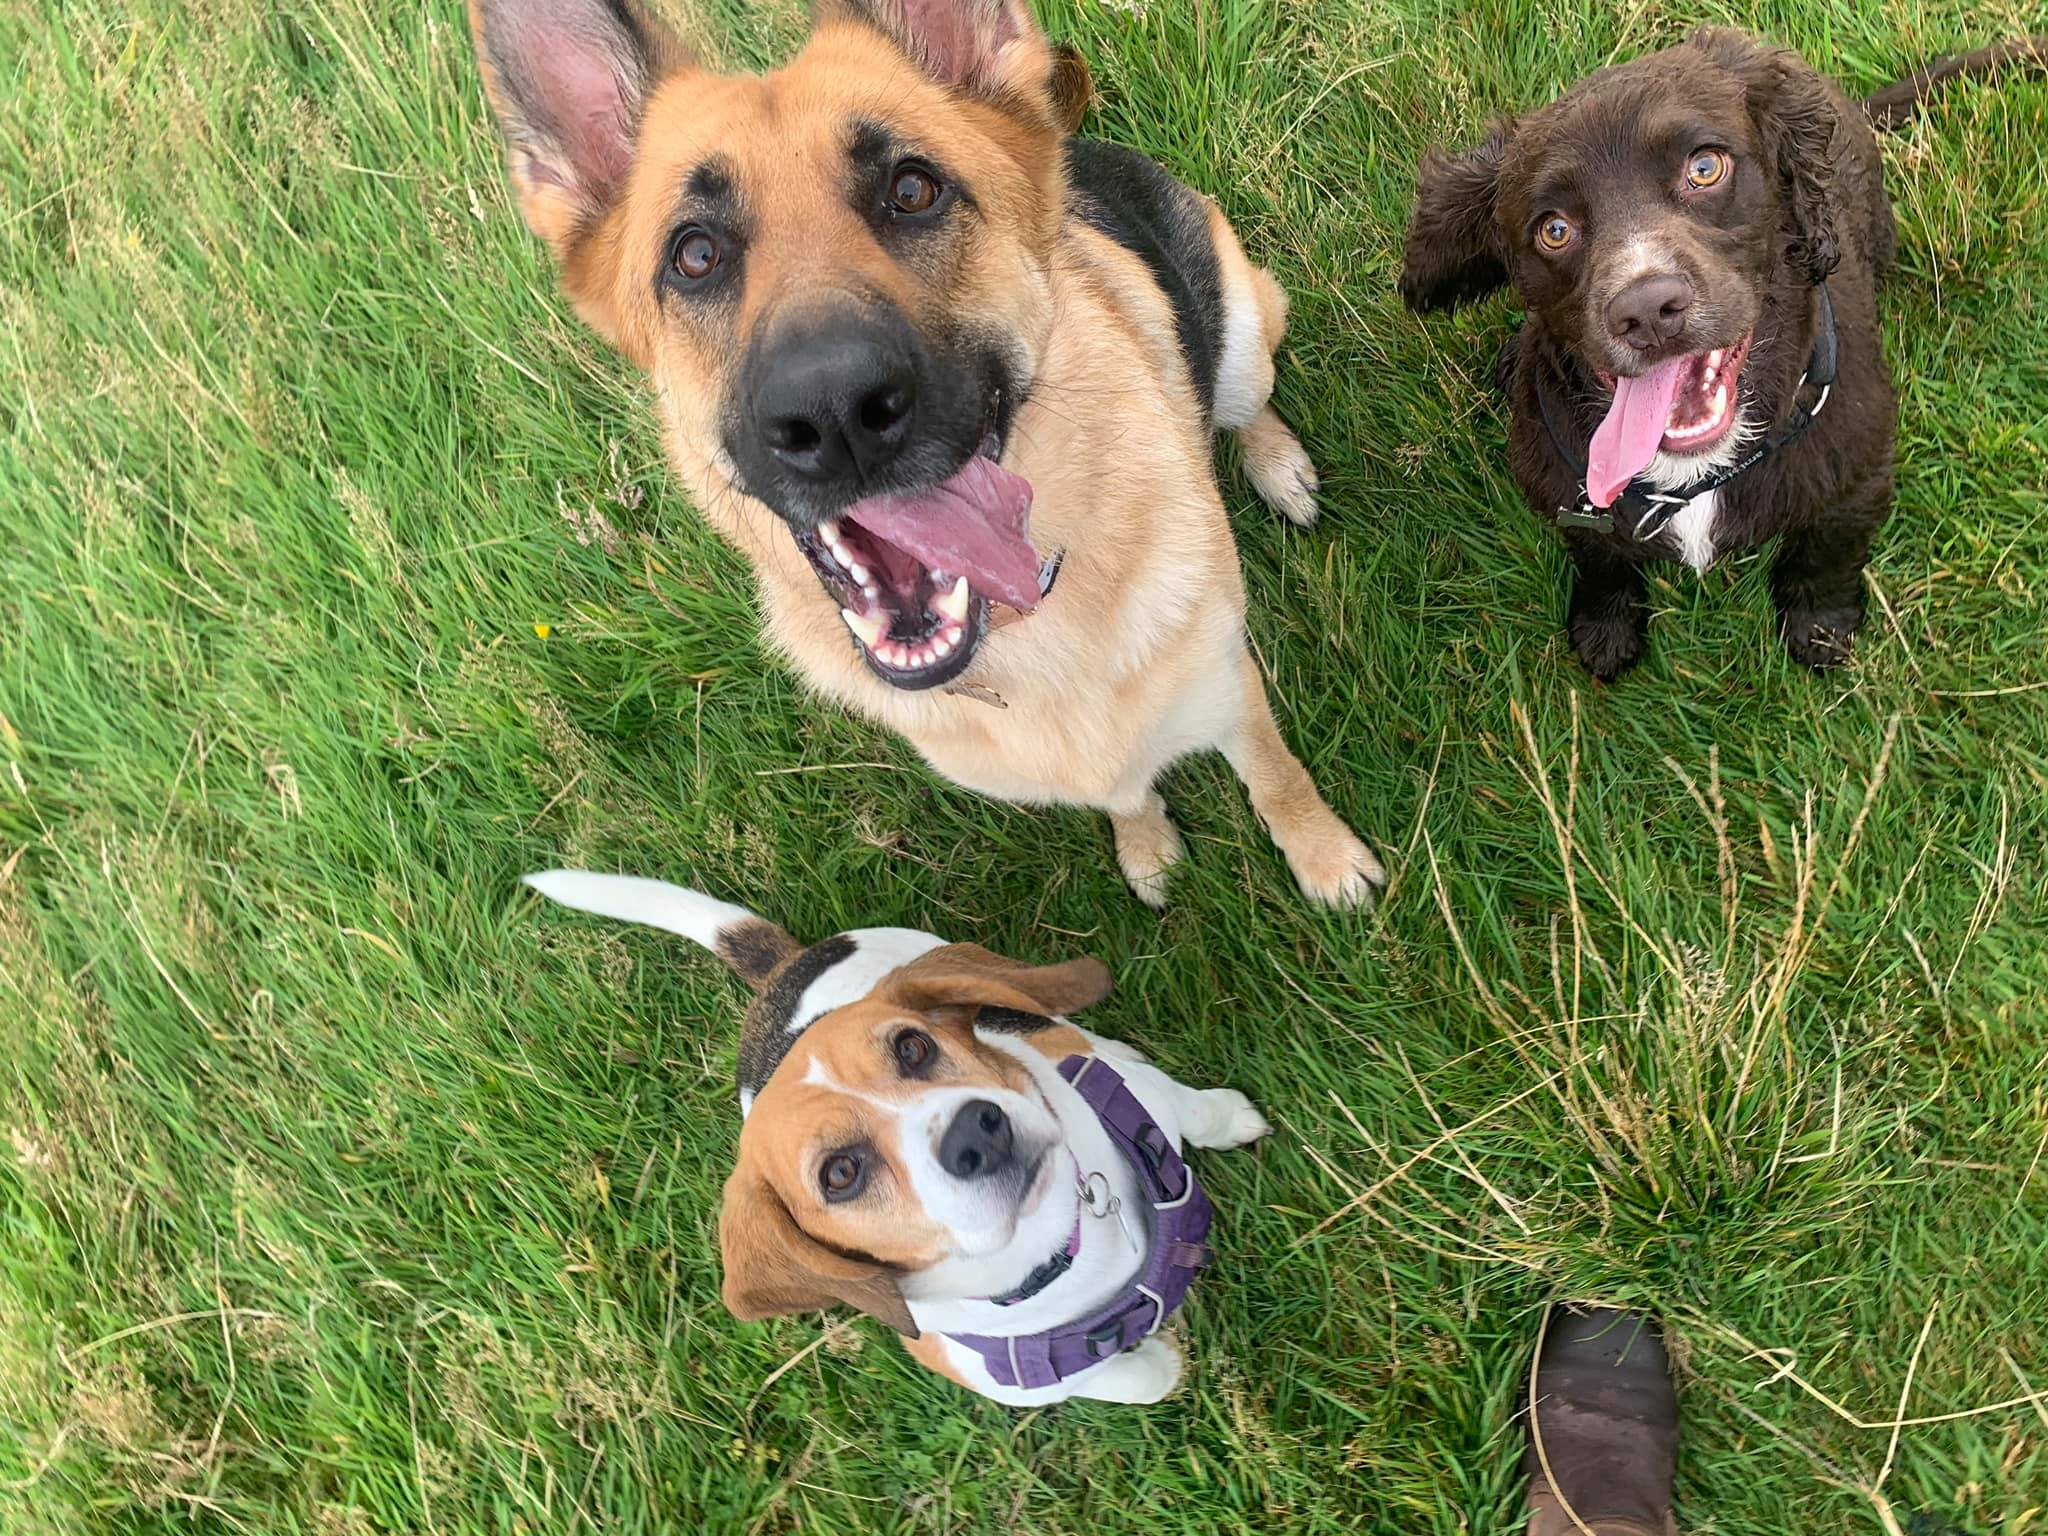 Beagle, German Shepherd and Spaniel in the Field